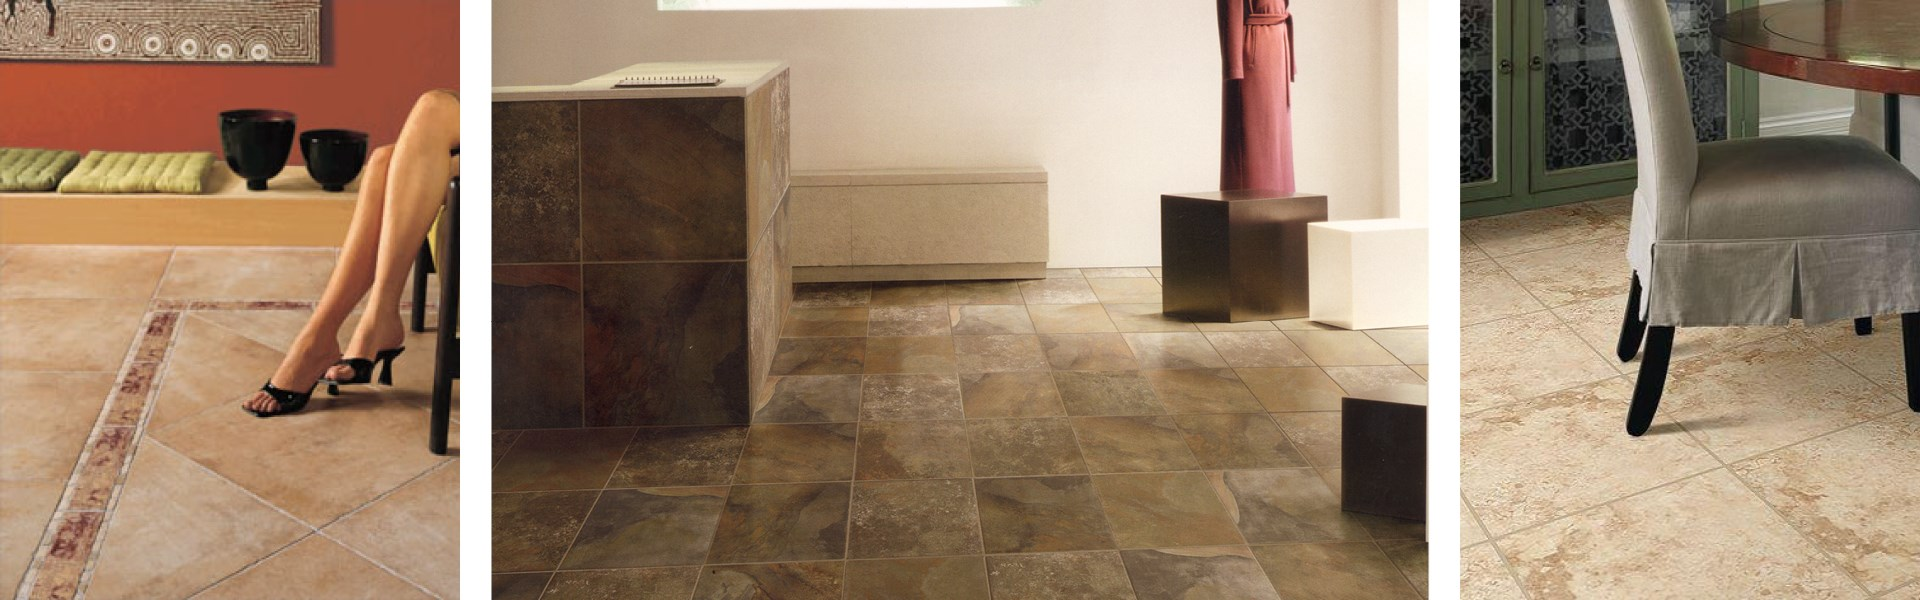 Boulevard Flooring & Design - Tile